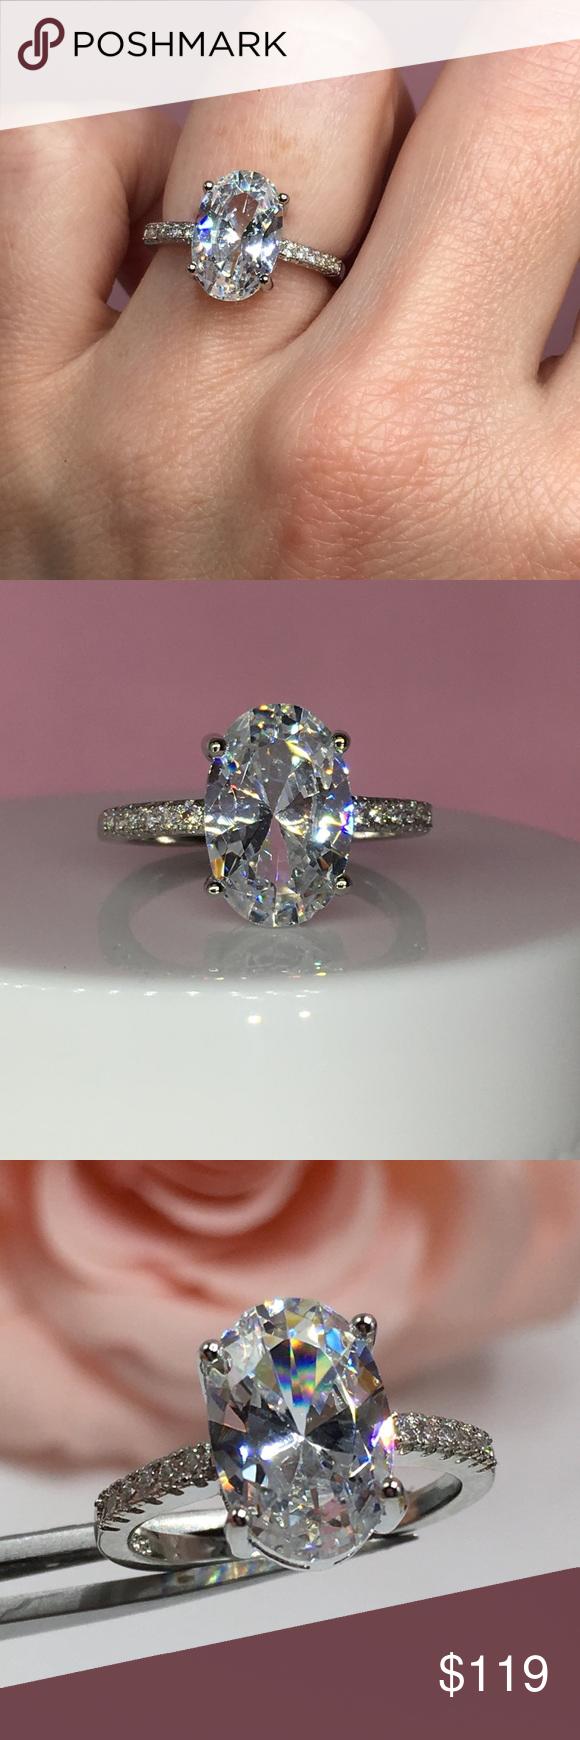 14k white gold oval diamond ring wedding 💍 stunning 3 ct